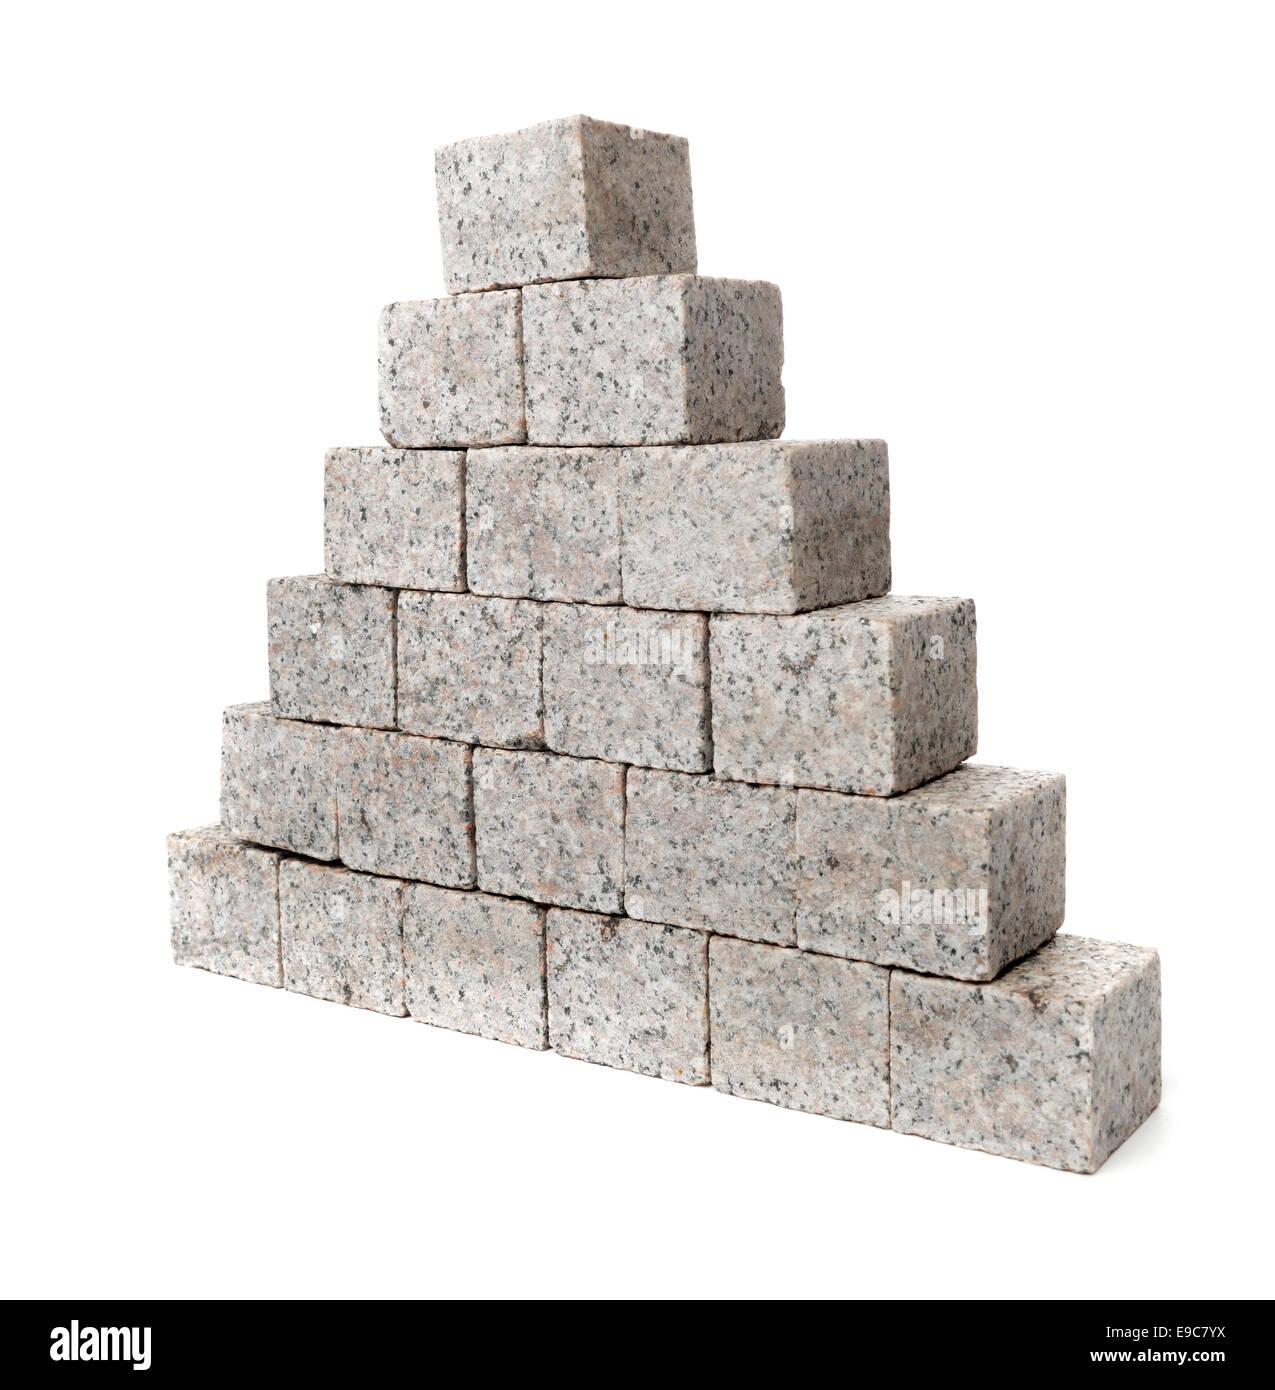 Pyramid made of small granite rock blocks. - Stock Image